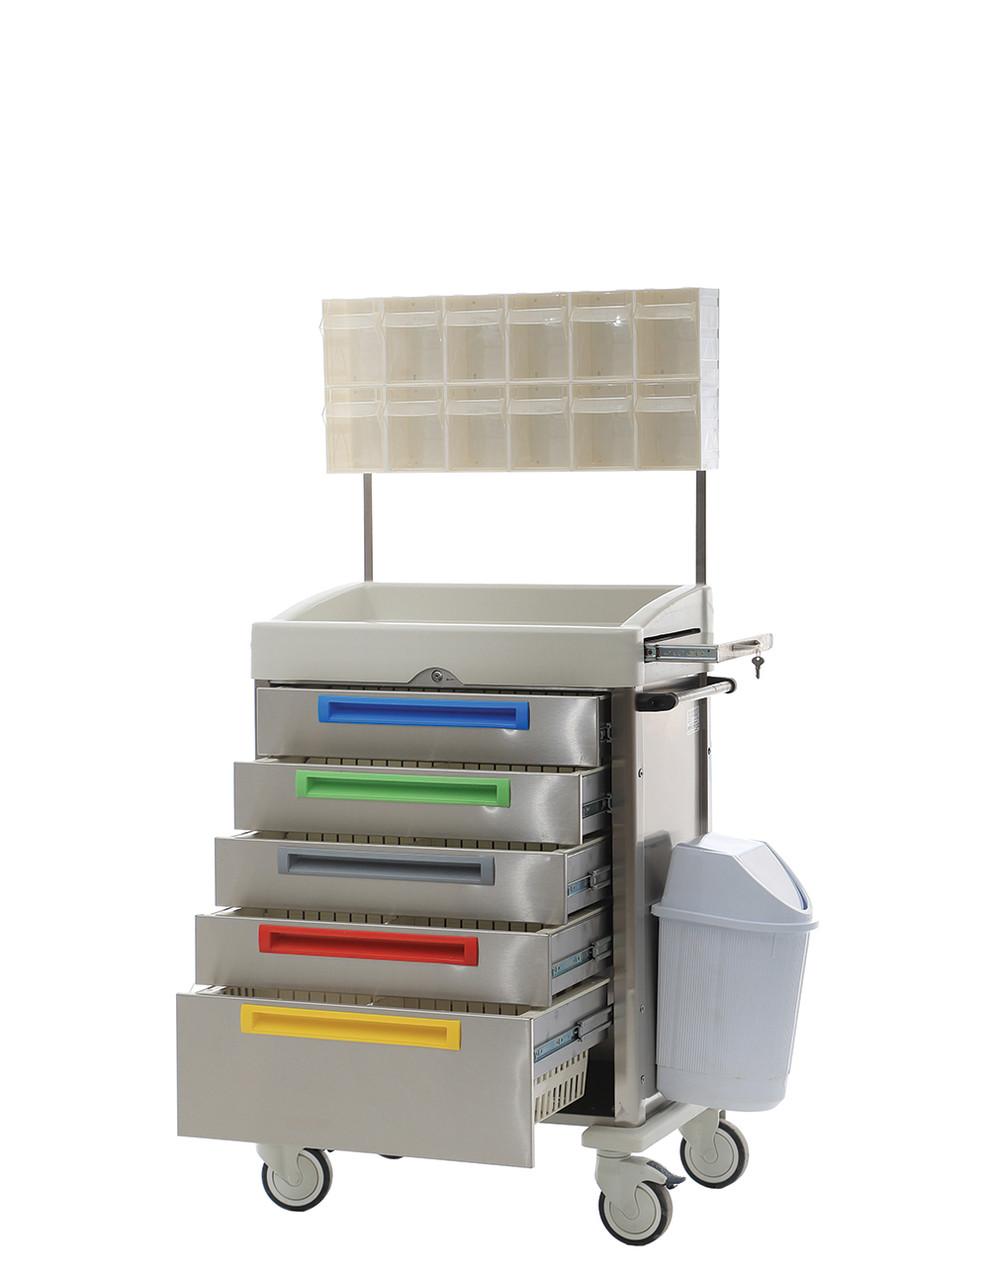 Тележка для анестезии PSA-310